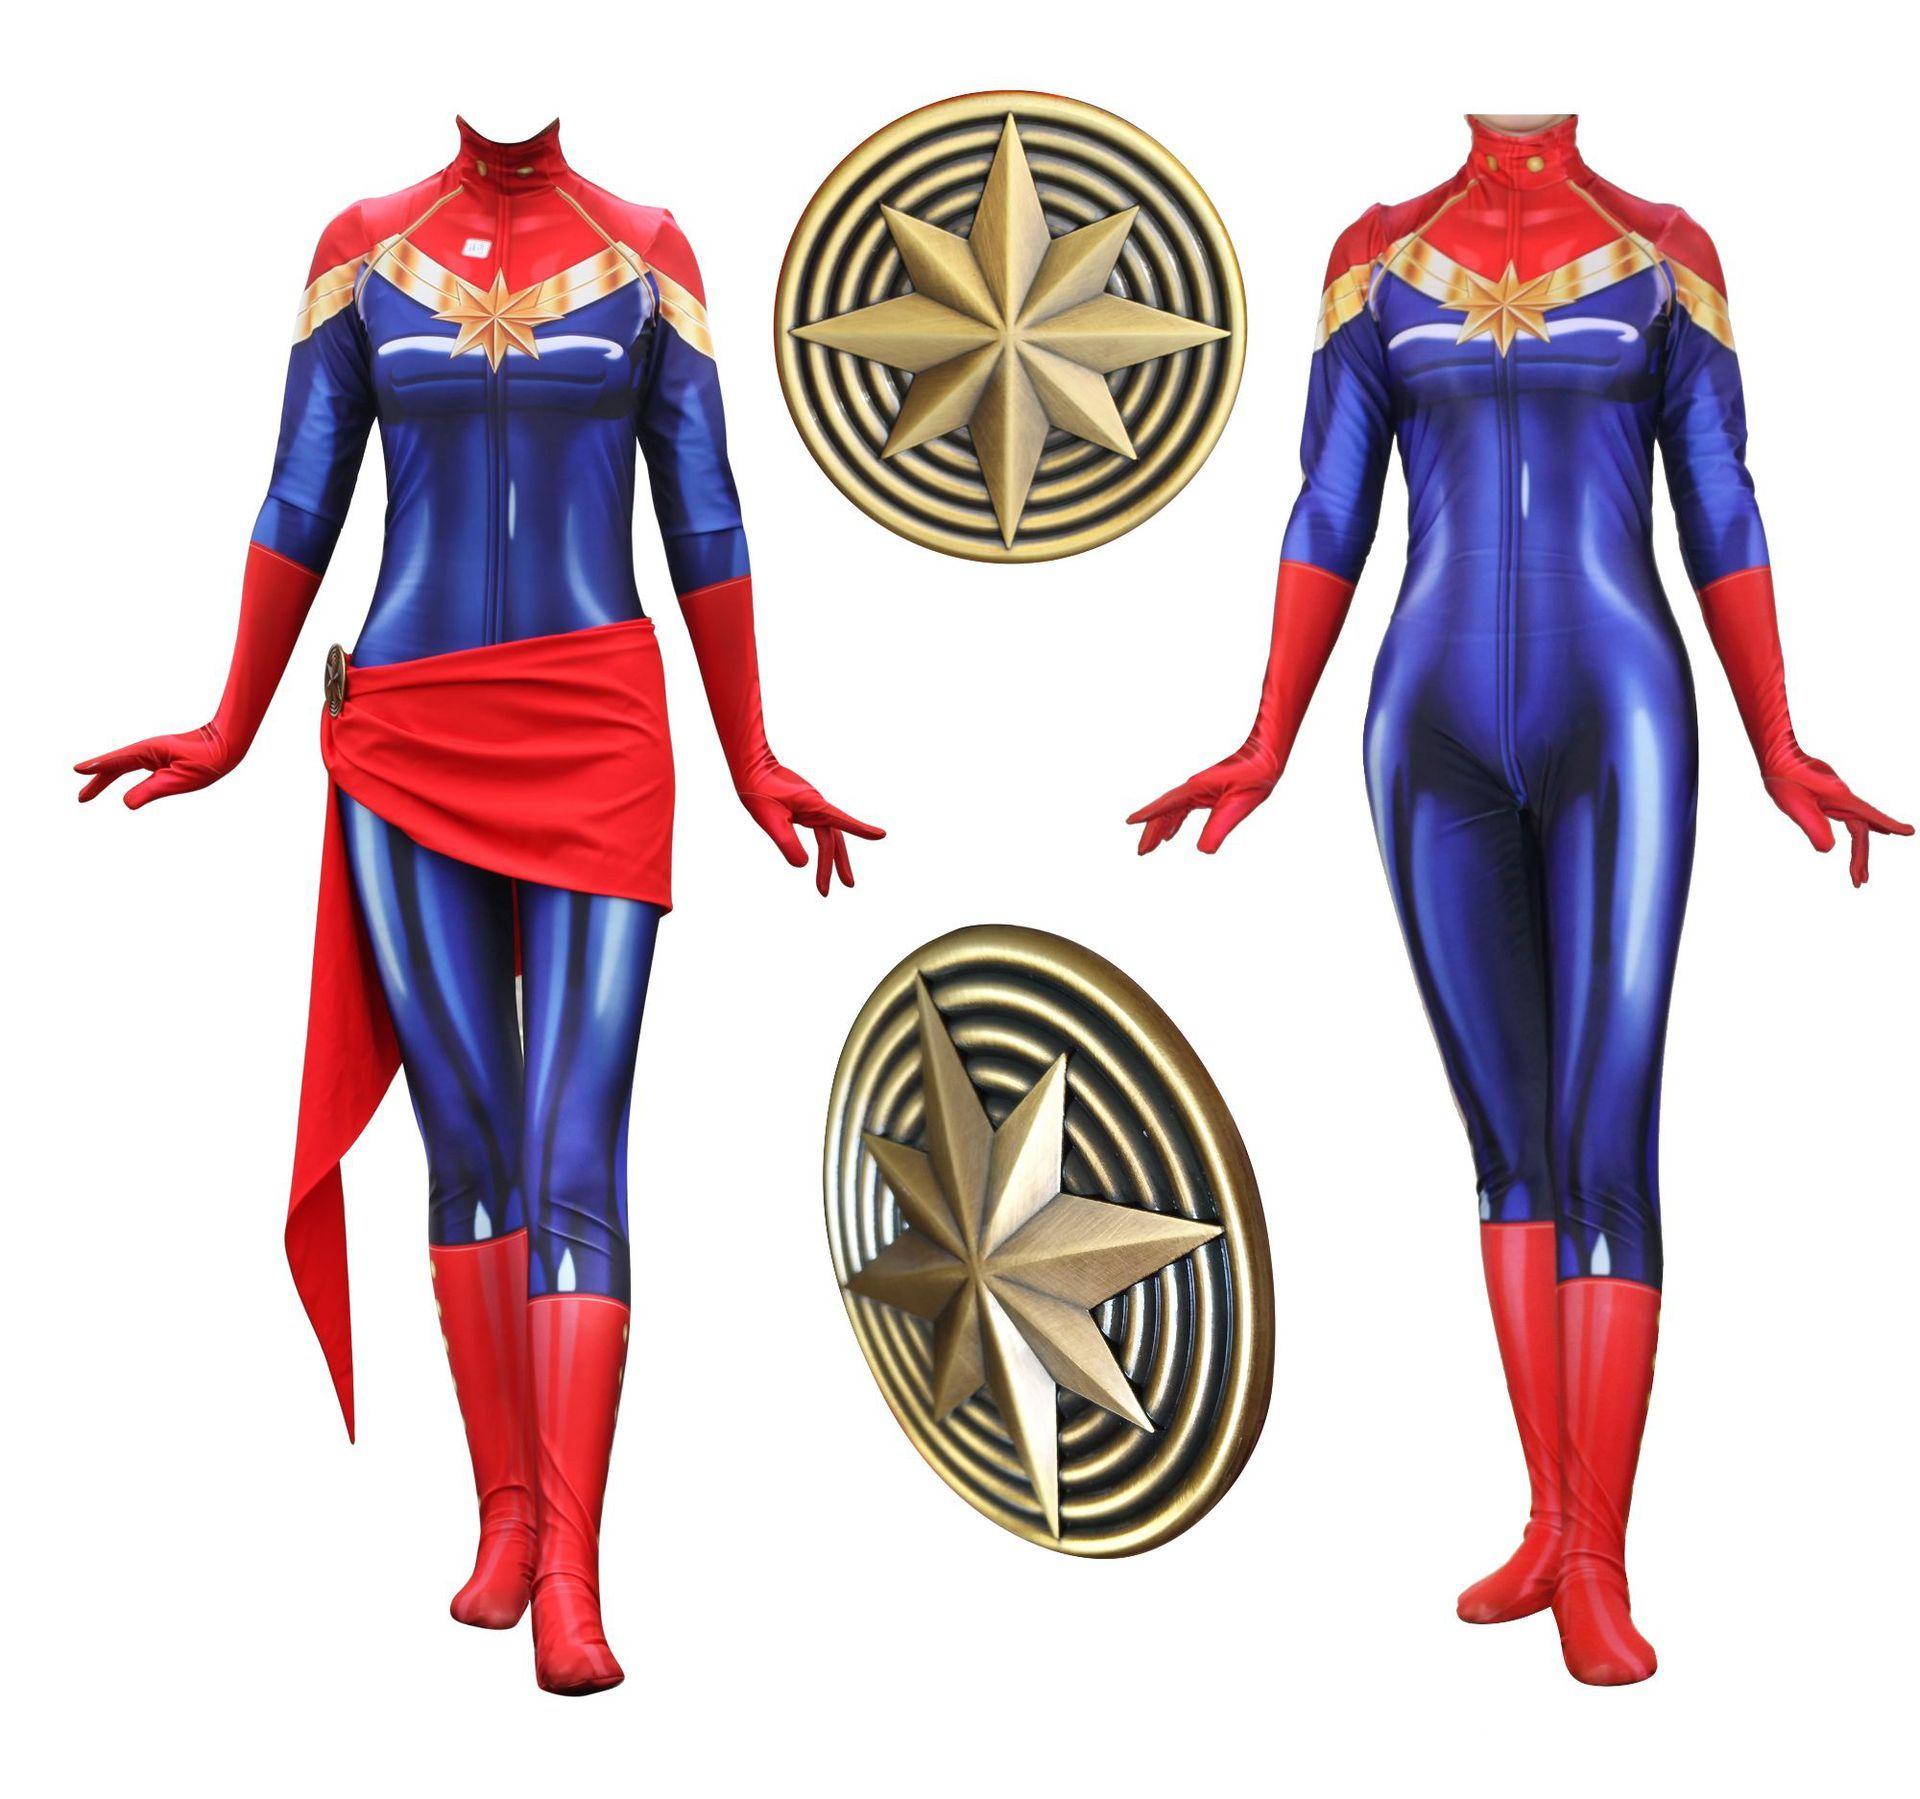 Unisex Superhero Avengers Captain Cosplay Jumpsuit Men Women Halloween Costume Spandex Lycra Bodysuit for Holiday Party